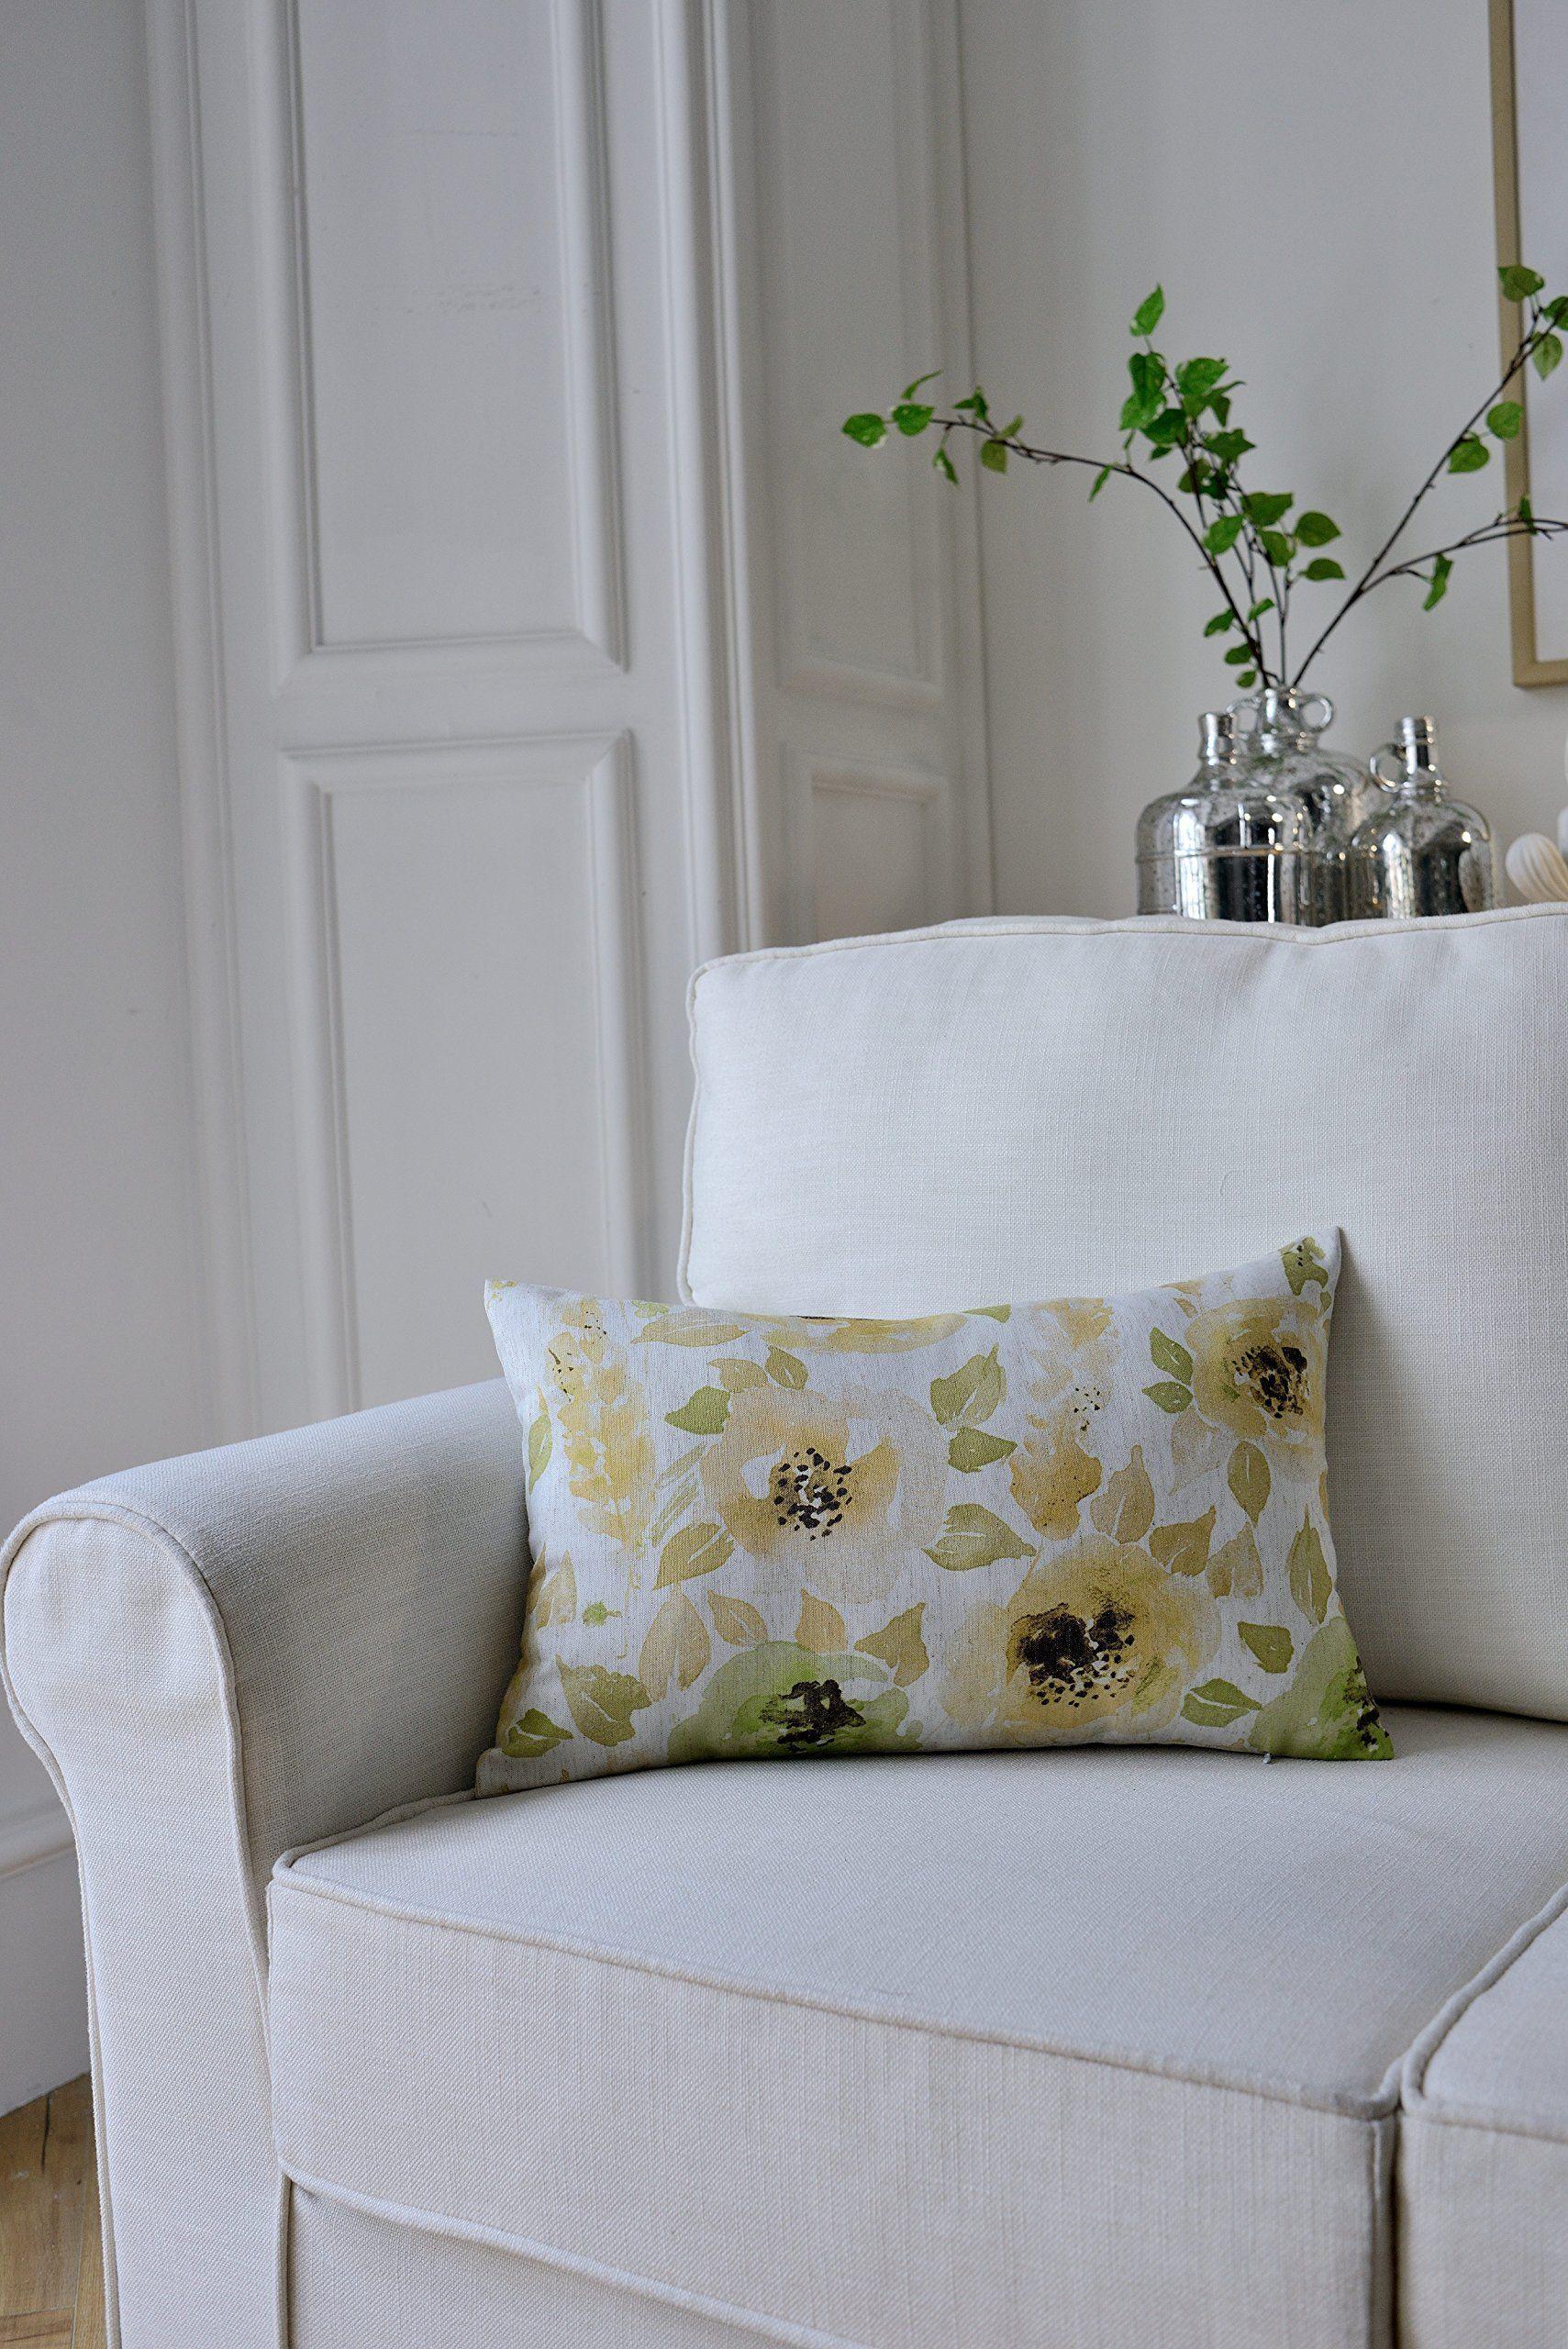 Mysky home set of floral design print cushion covers sofa chair